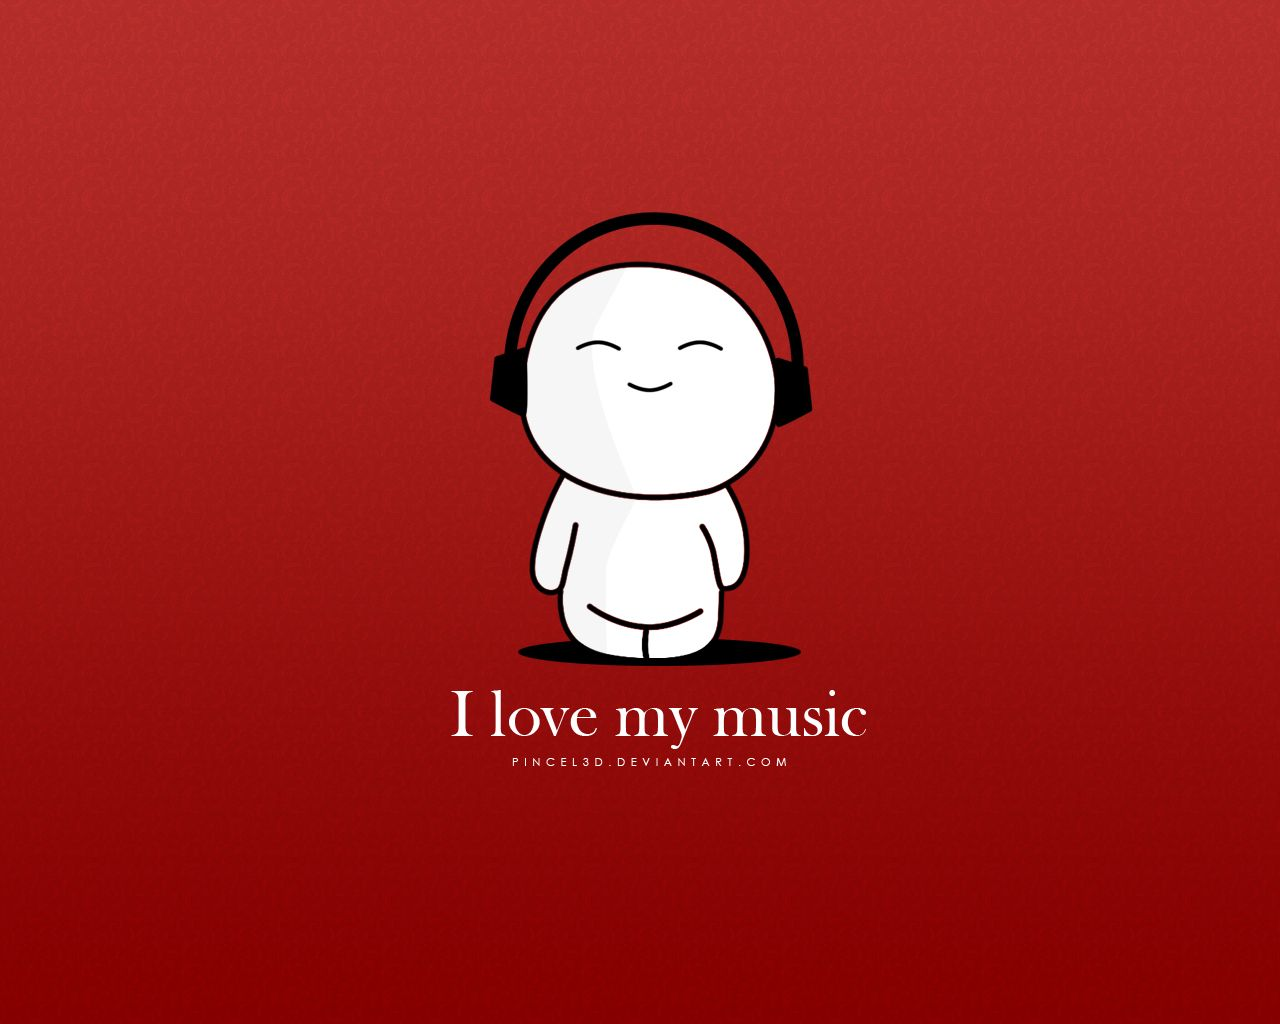 I Love Music Hd Wallpaper For Mobile: Love Music Wallpapers